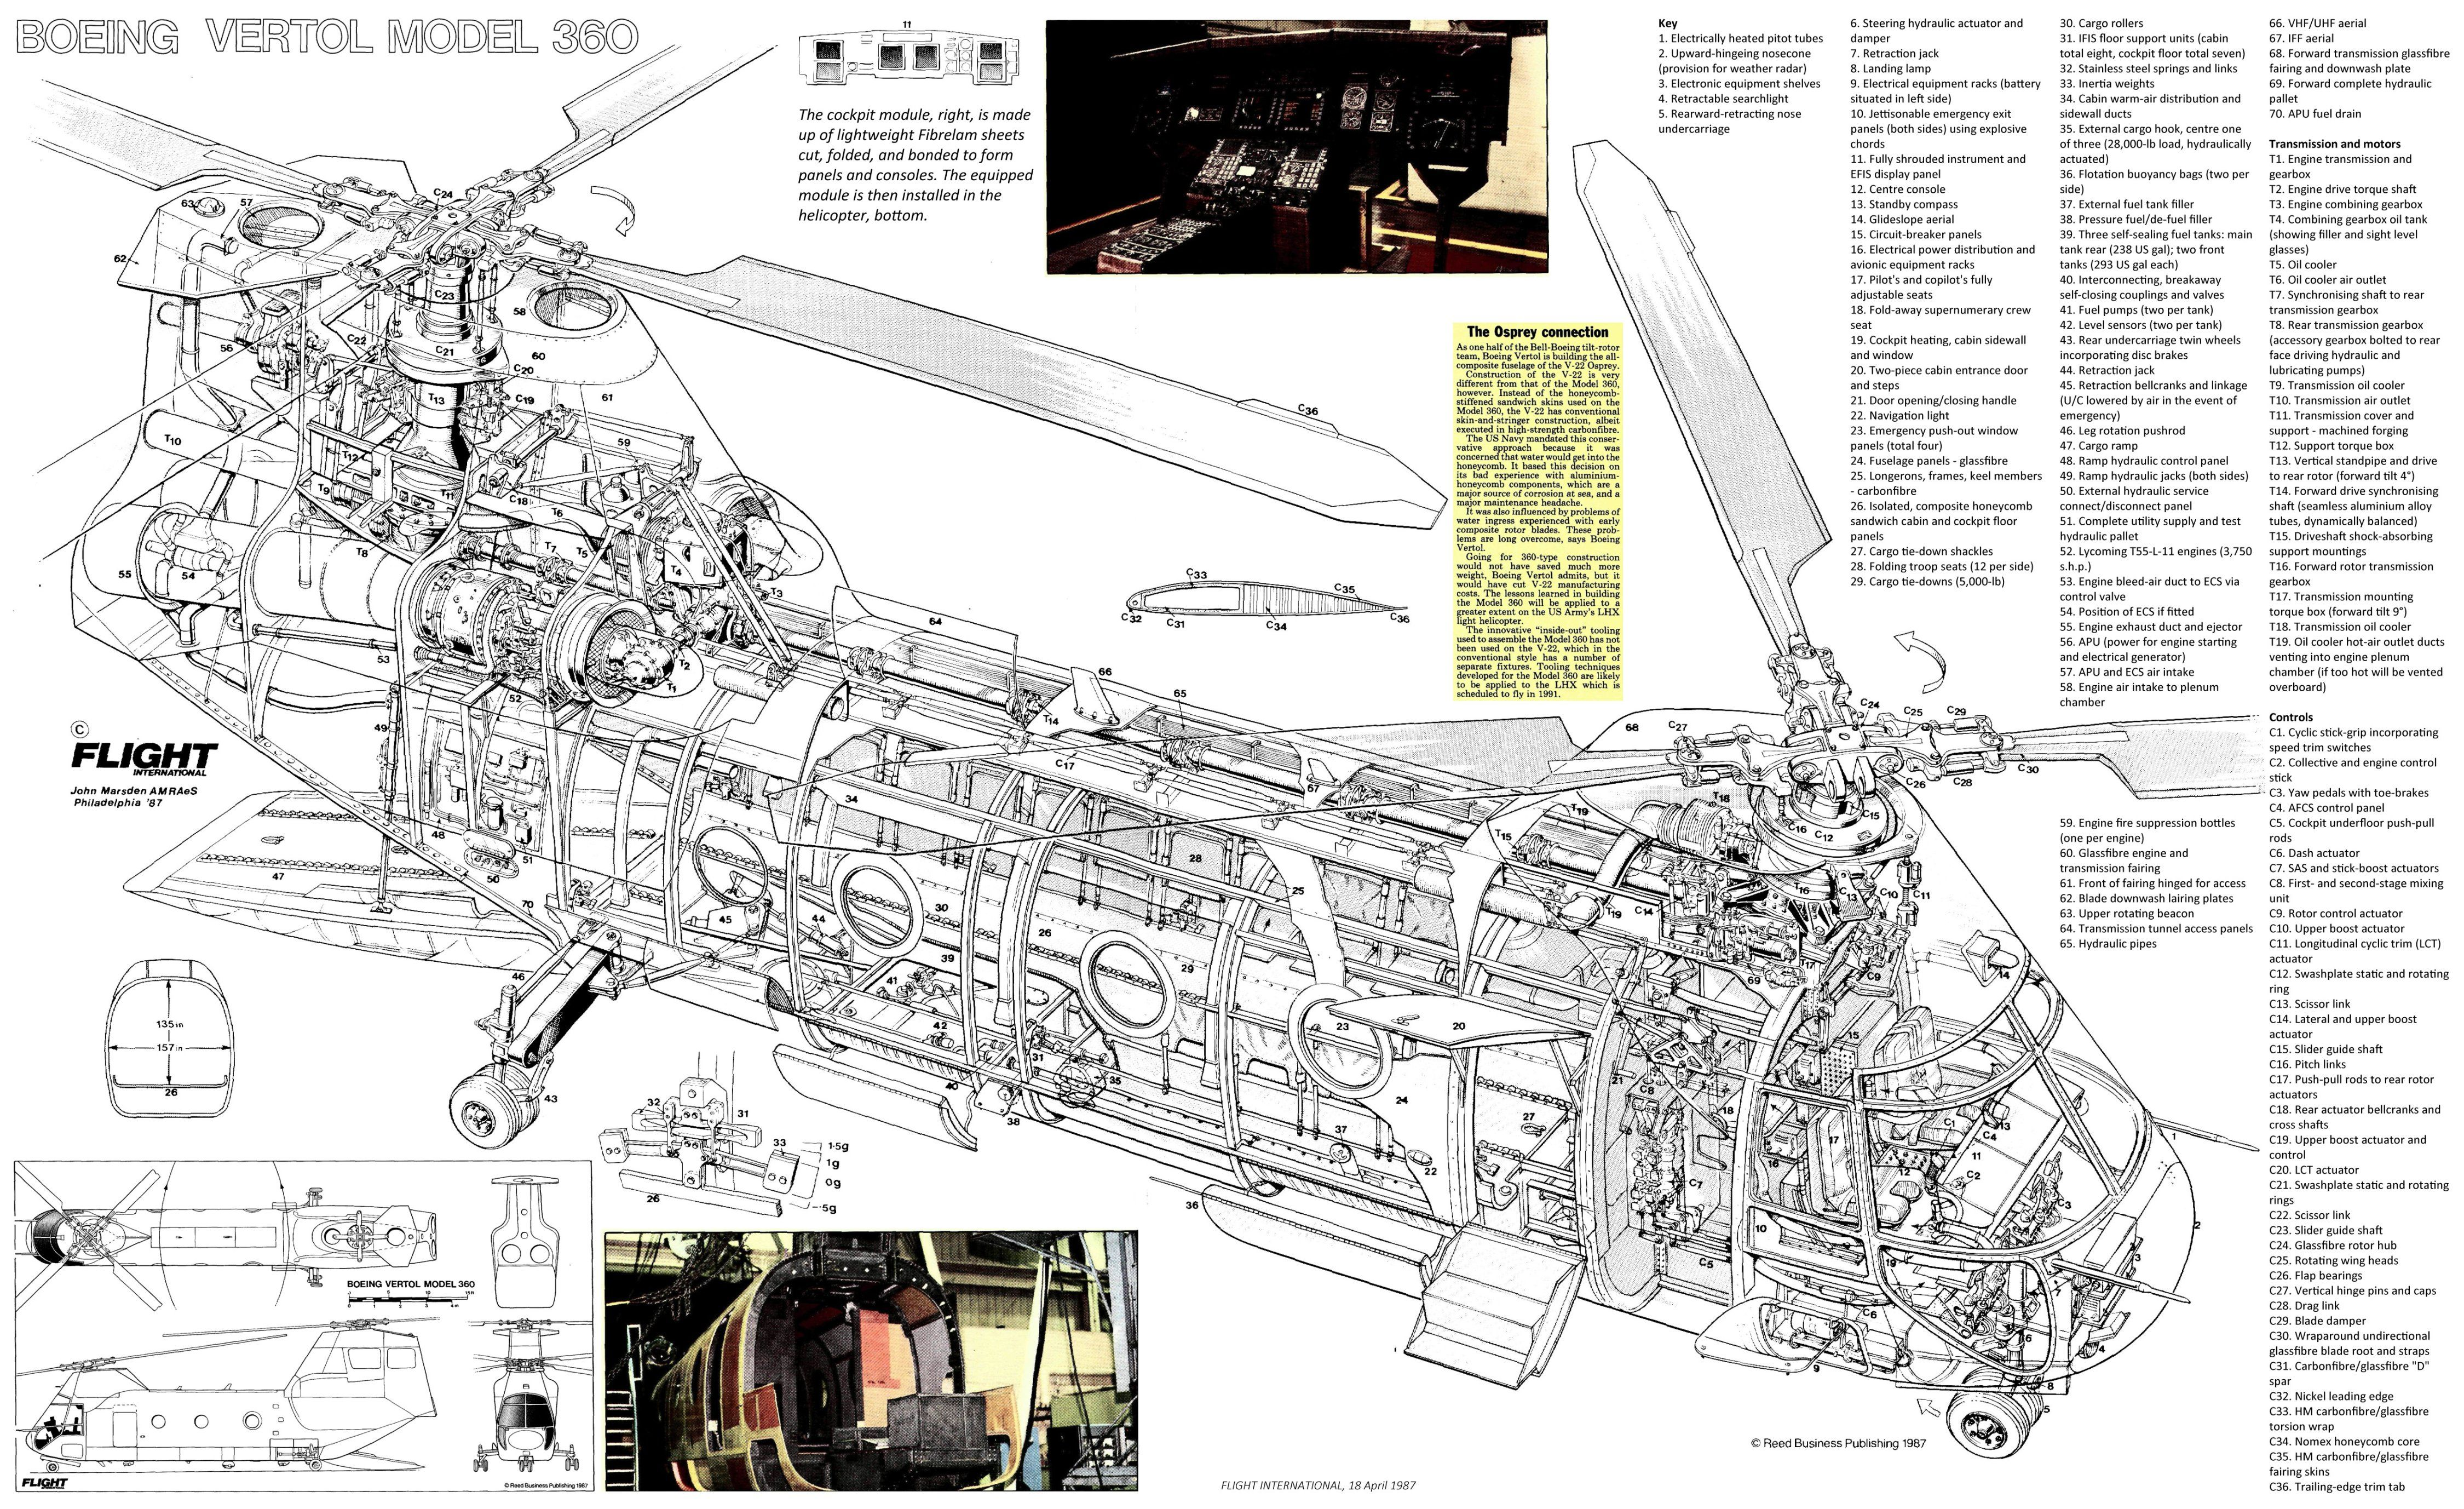 medium resolution of boeing vertol 360 cutaway technical illustration technical drawing boeing ch 47 chinook air